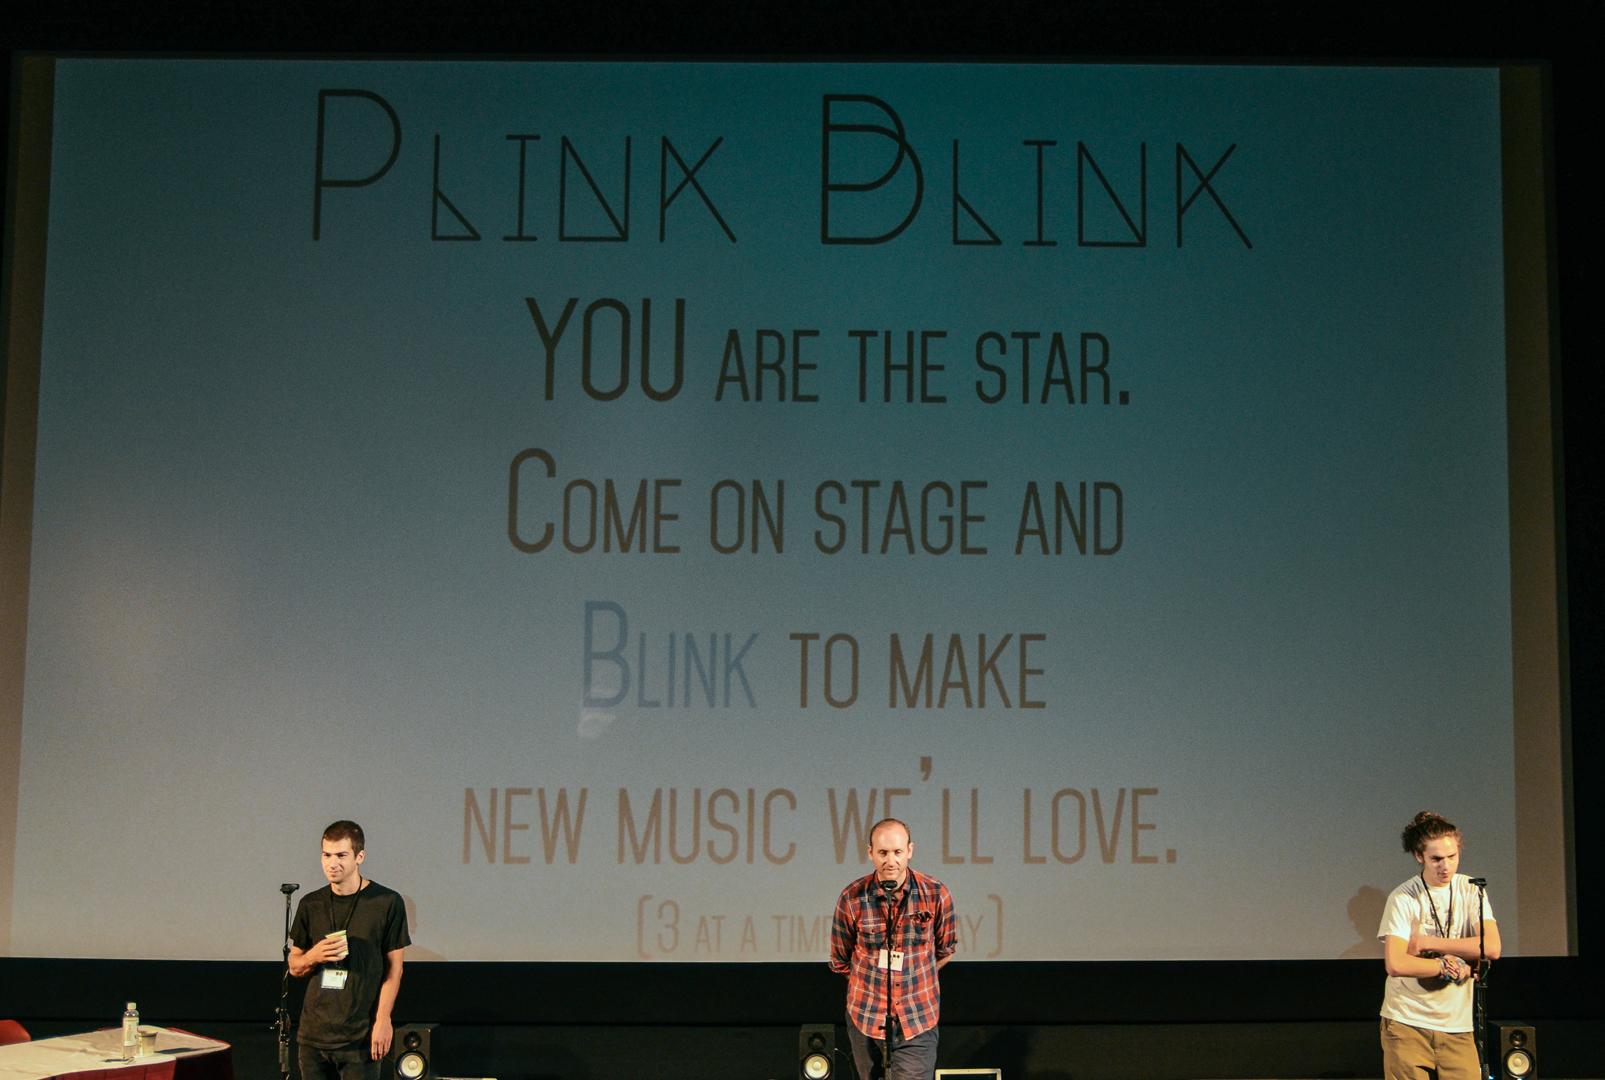 ©2014, Ozge Samanci, Blacki Li Rudi Migliozzi, and Daniel Sabio, Plink Blink